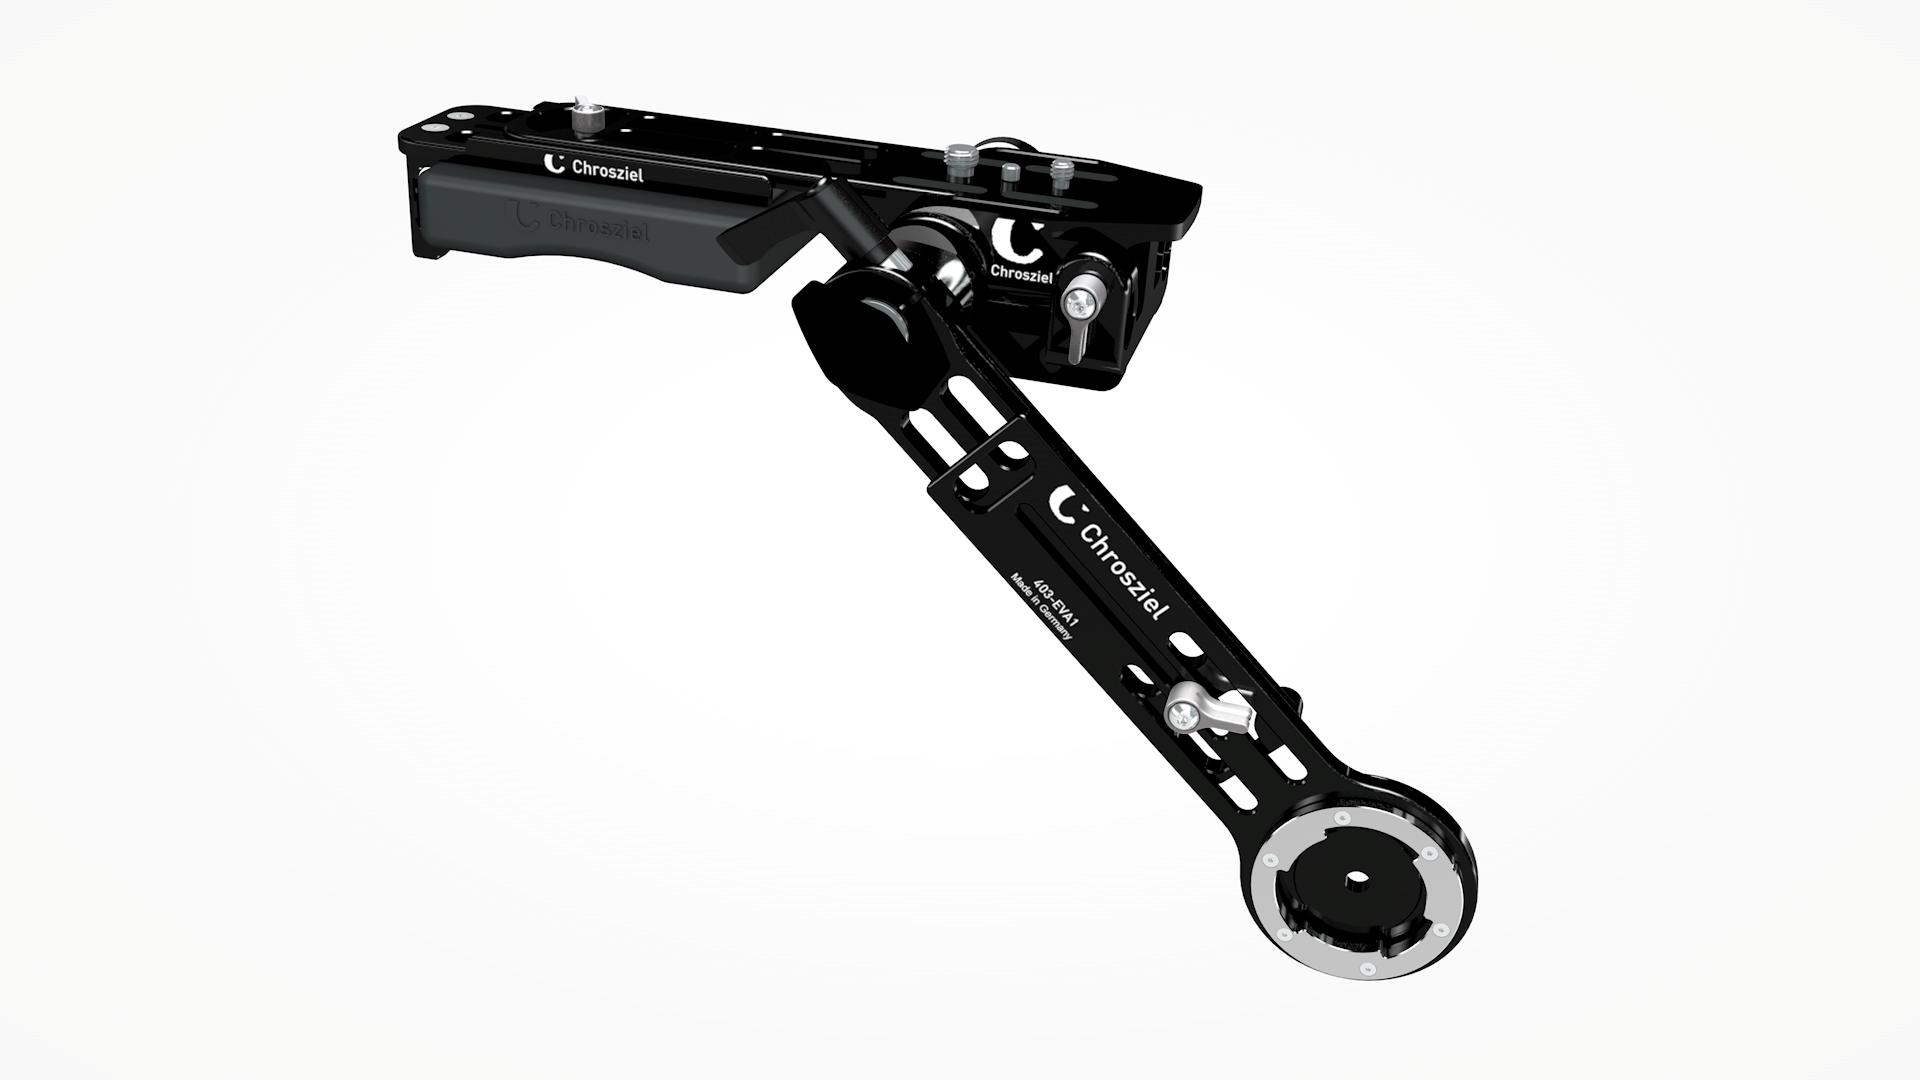 Kit for Pana AU-EVA1: Lightweight Support, Handgrip Extender